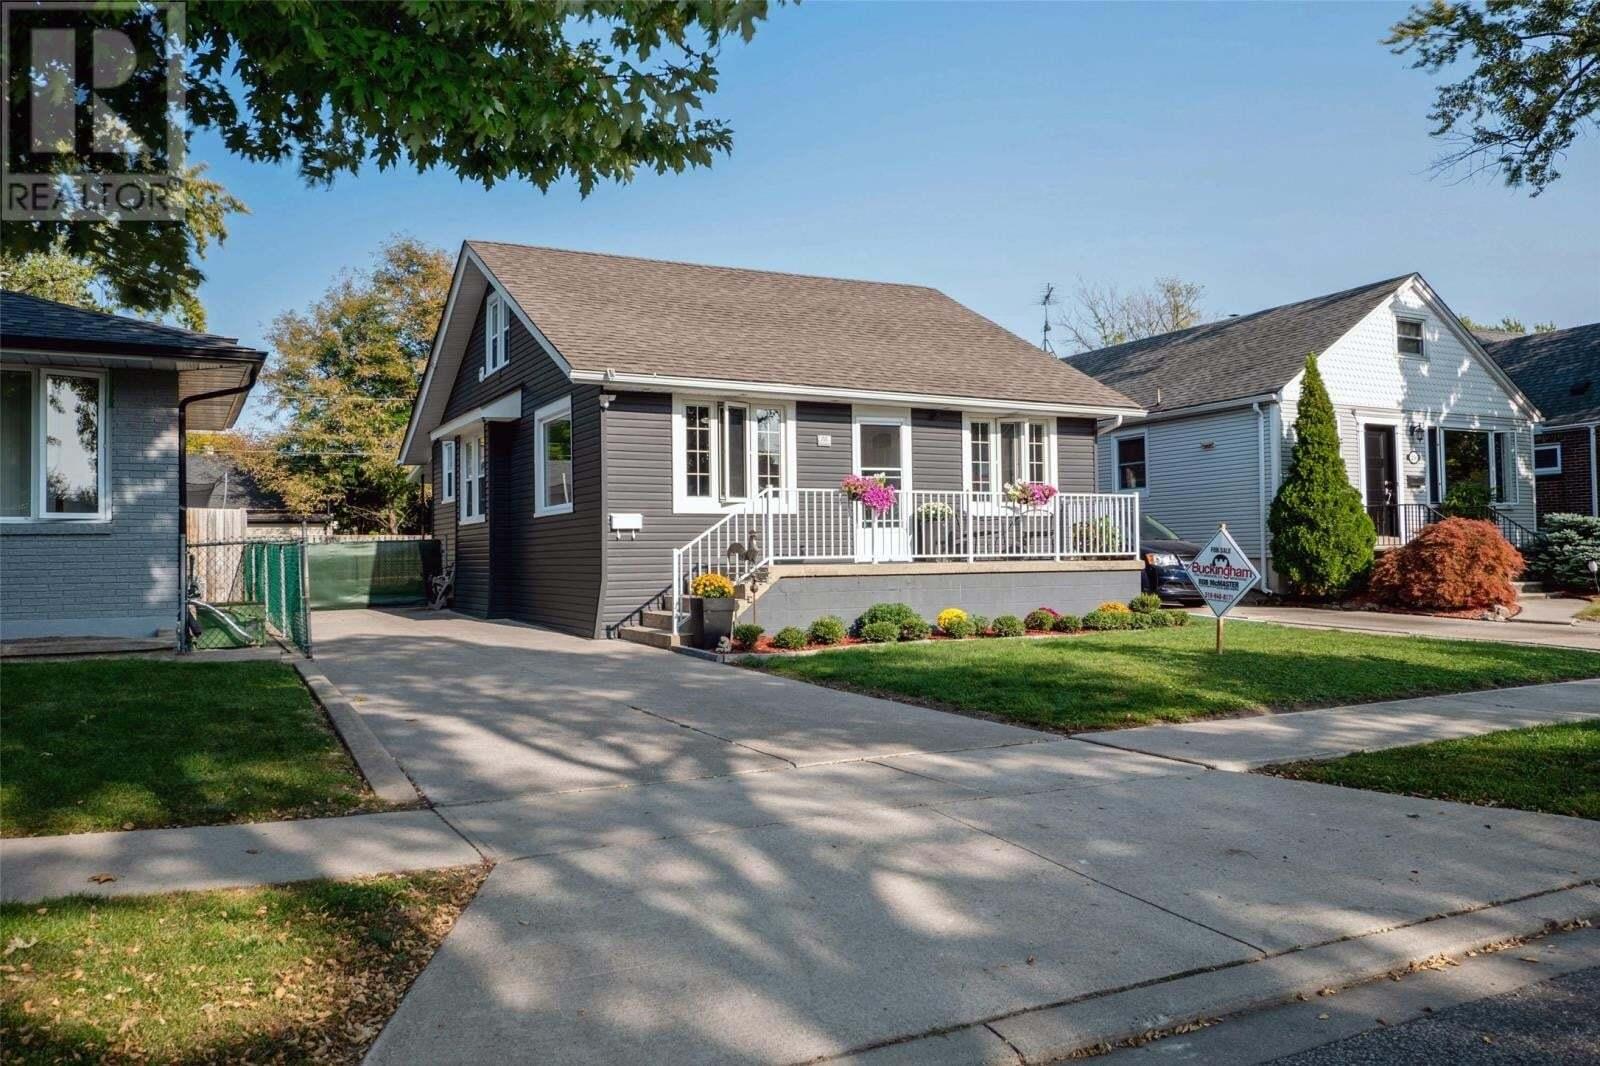 House for sale at 250 Belleperche  Windsor Ontario - MLS: 20012702